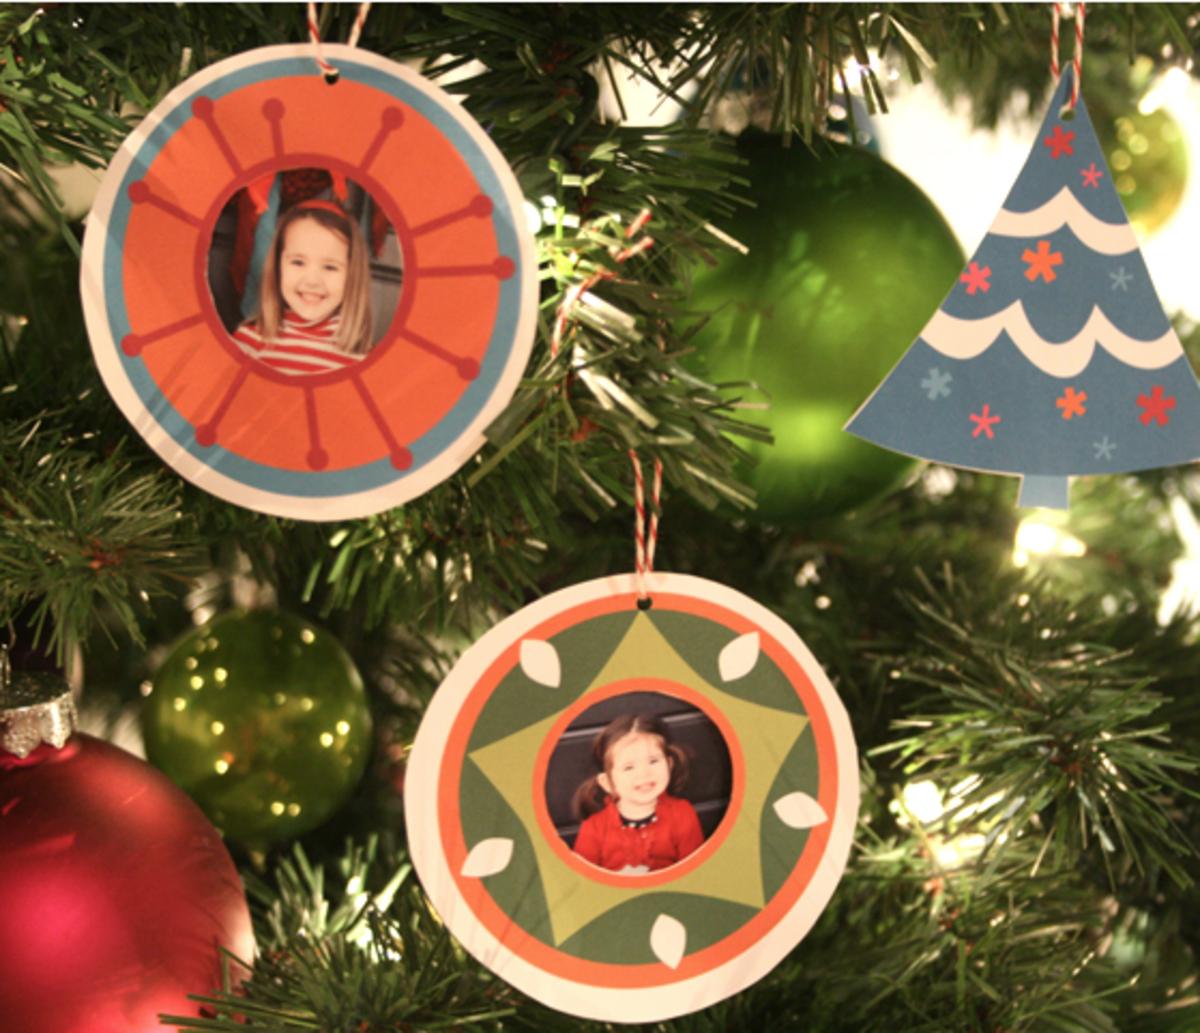 Free Printable Ornaments - Today's Mama - Free Printable Christmas Ornaments